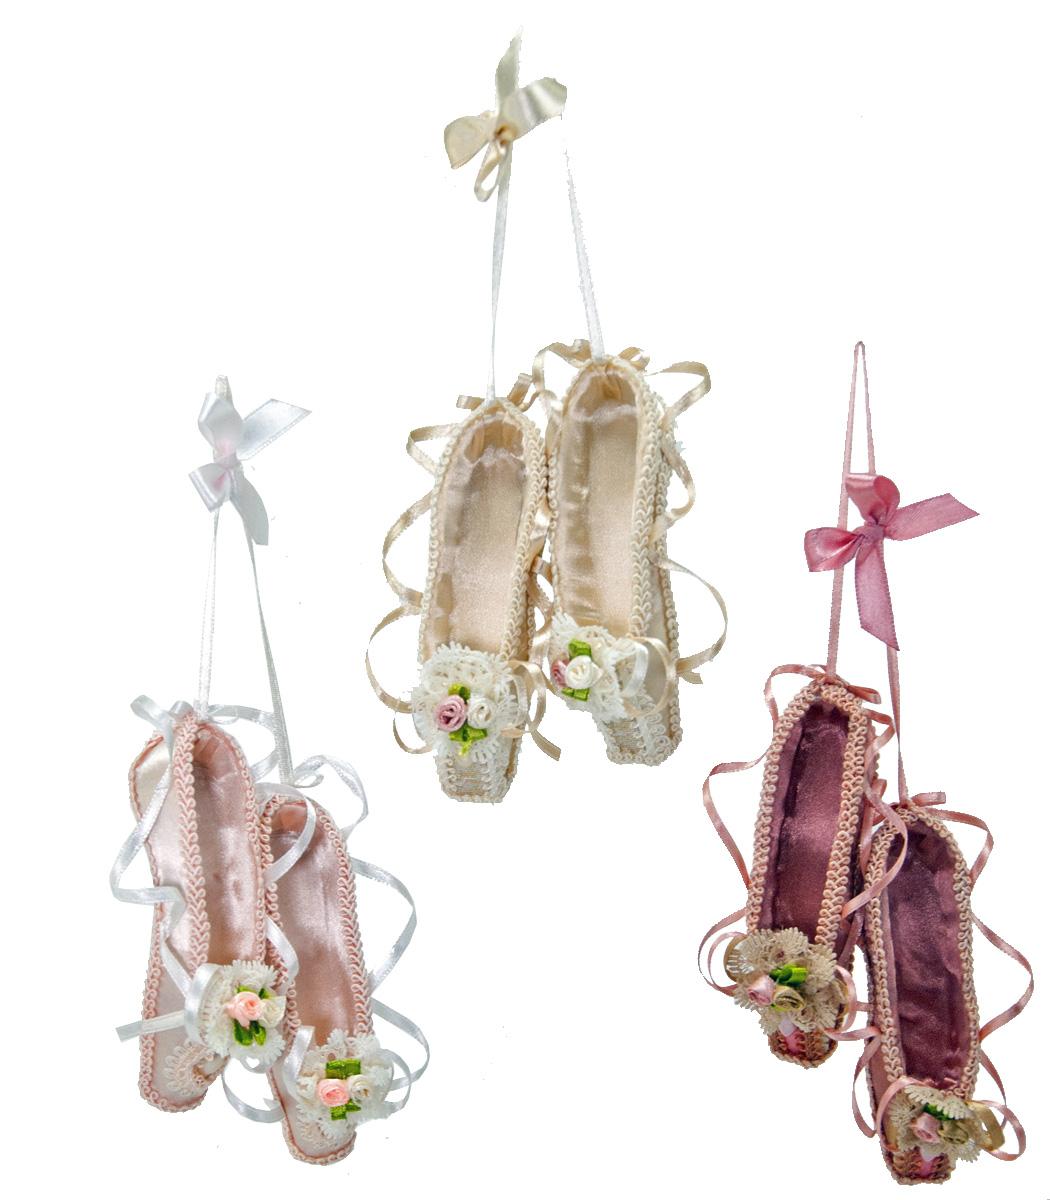 Ballerina Shoe Ornament - Assortment Of 3  18-584463